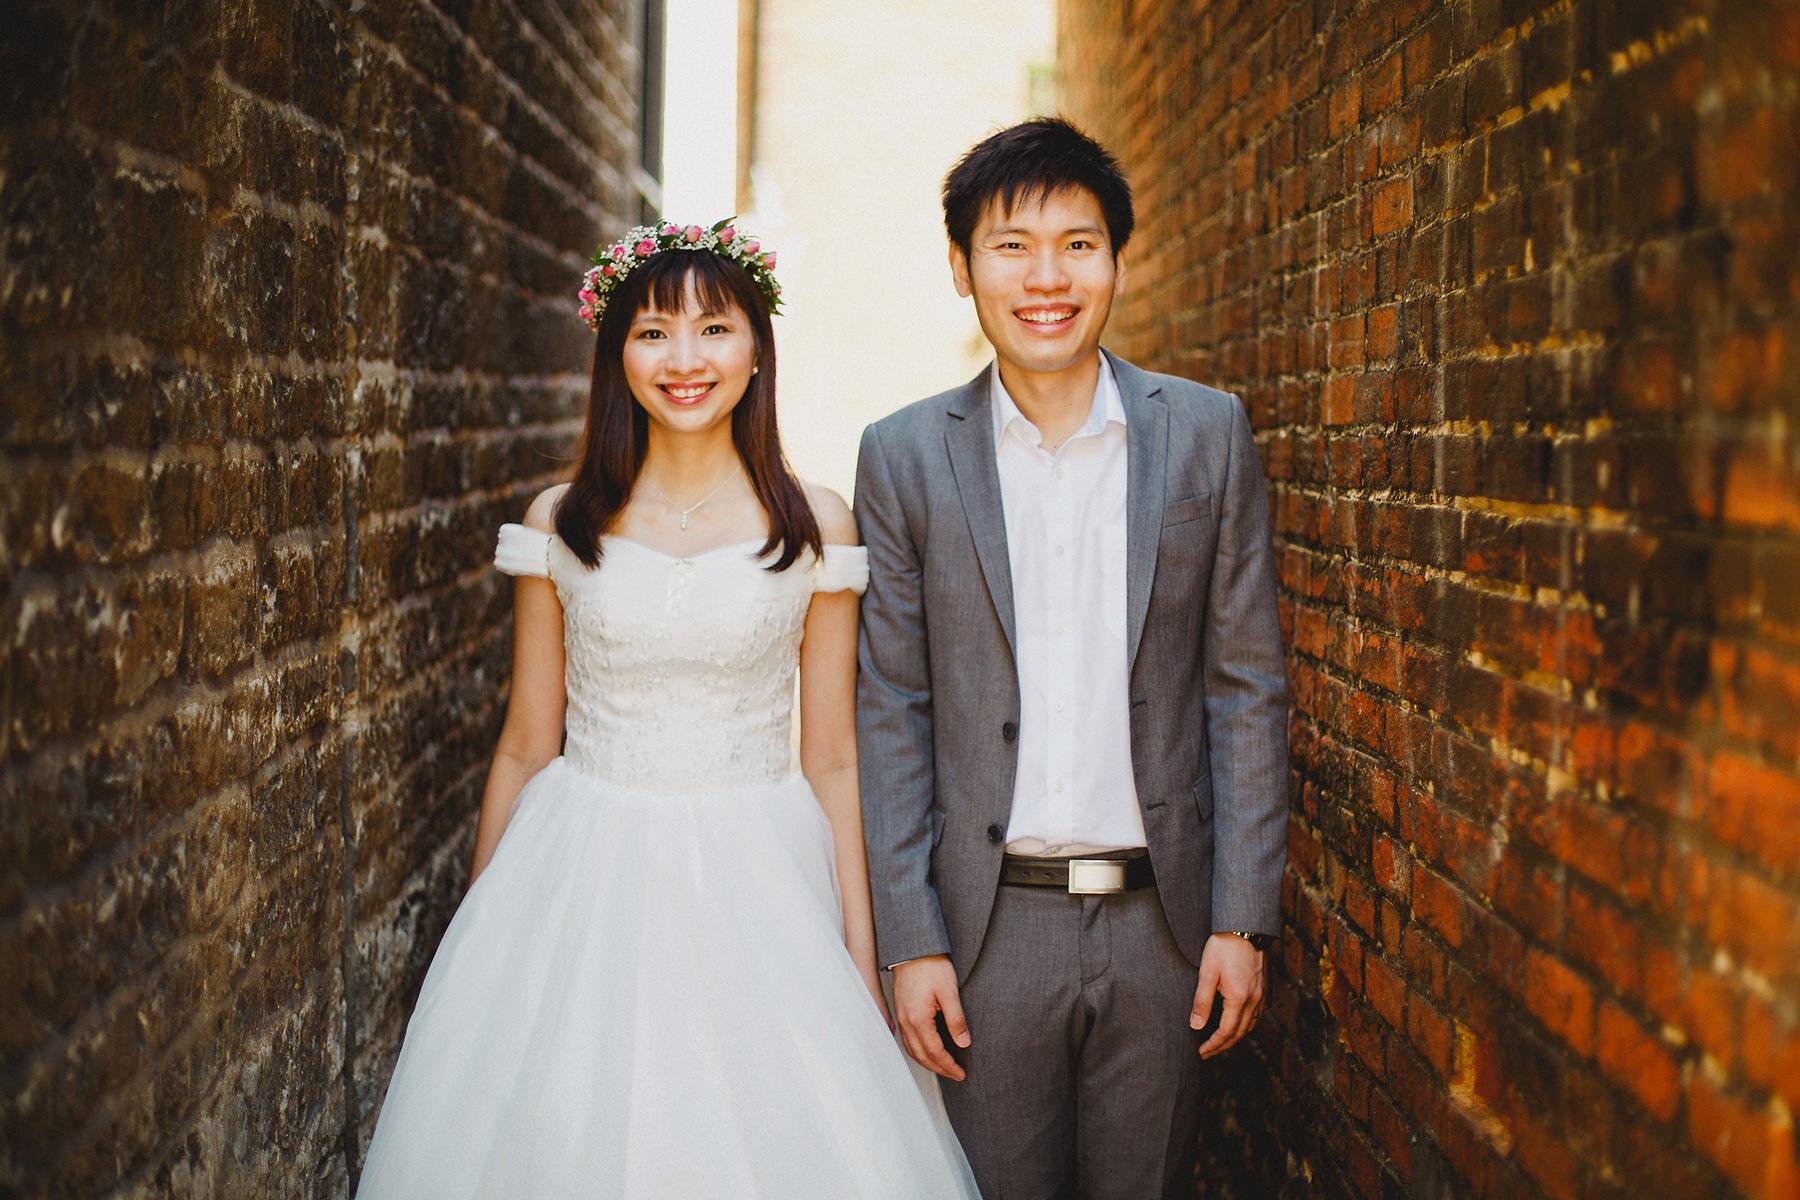 Oxford wedding photo